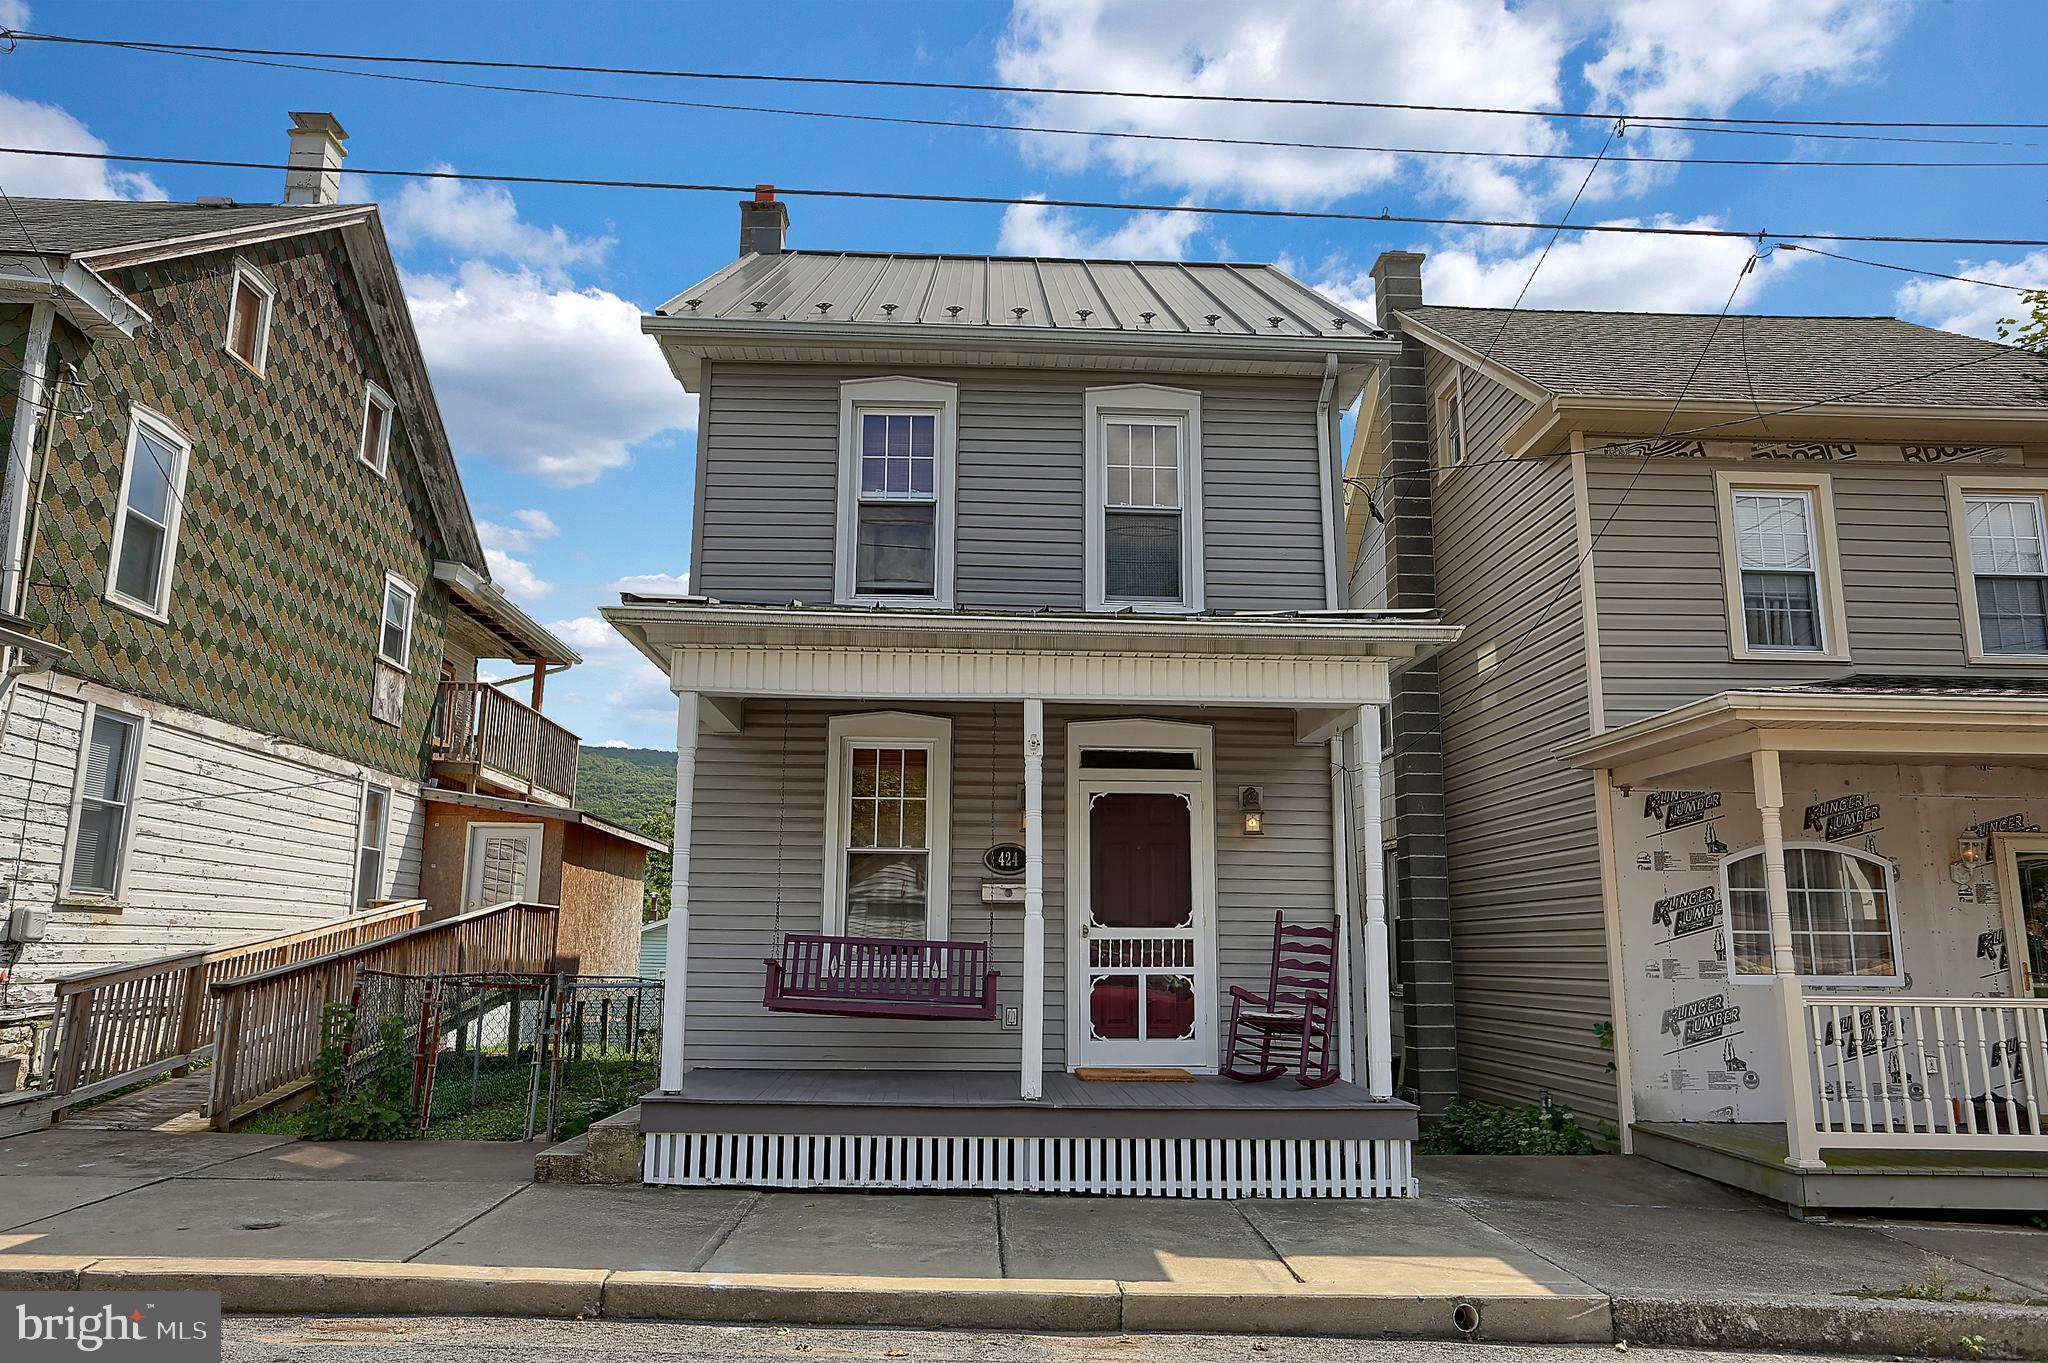 424 JULIAN STREET, WILLIAMSTOWN, PA 17098